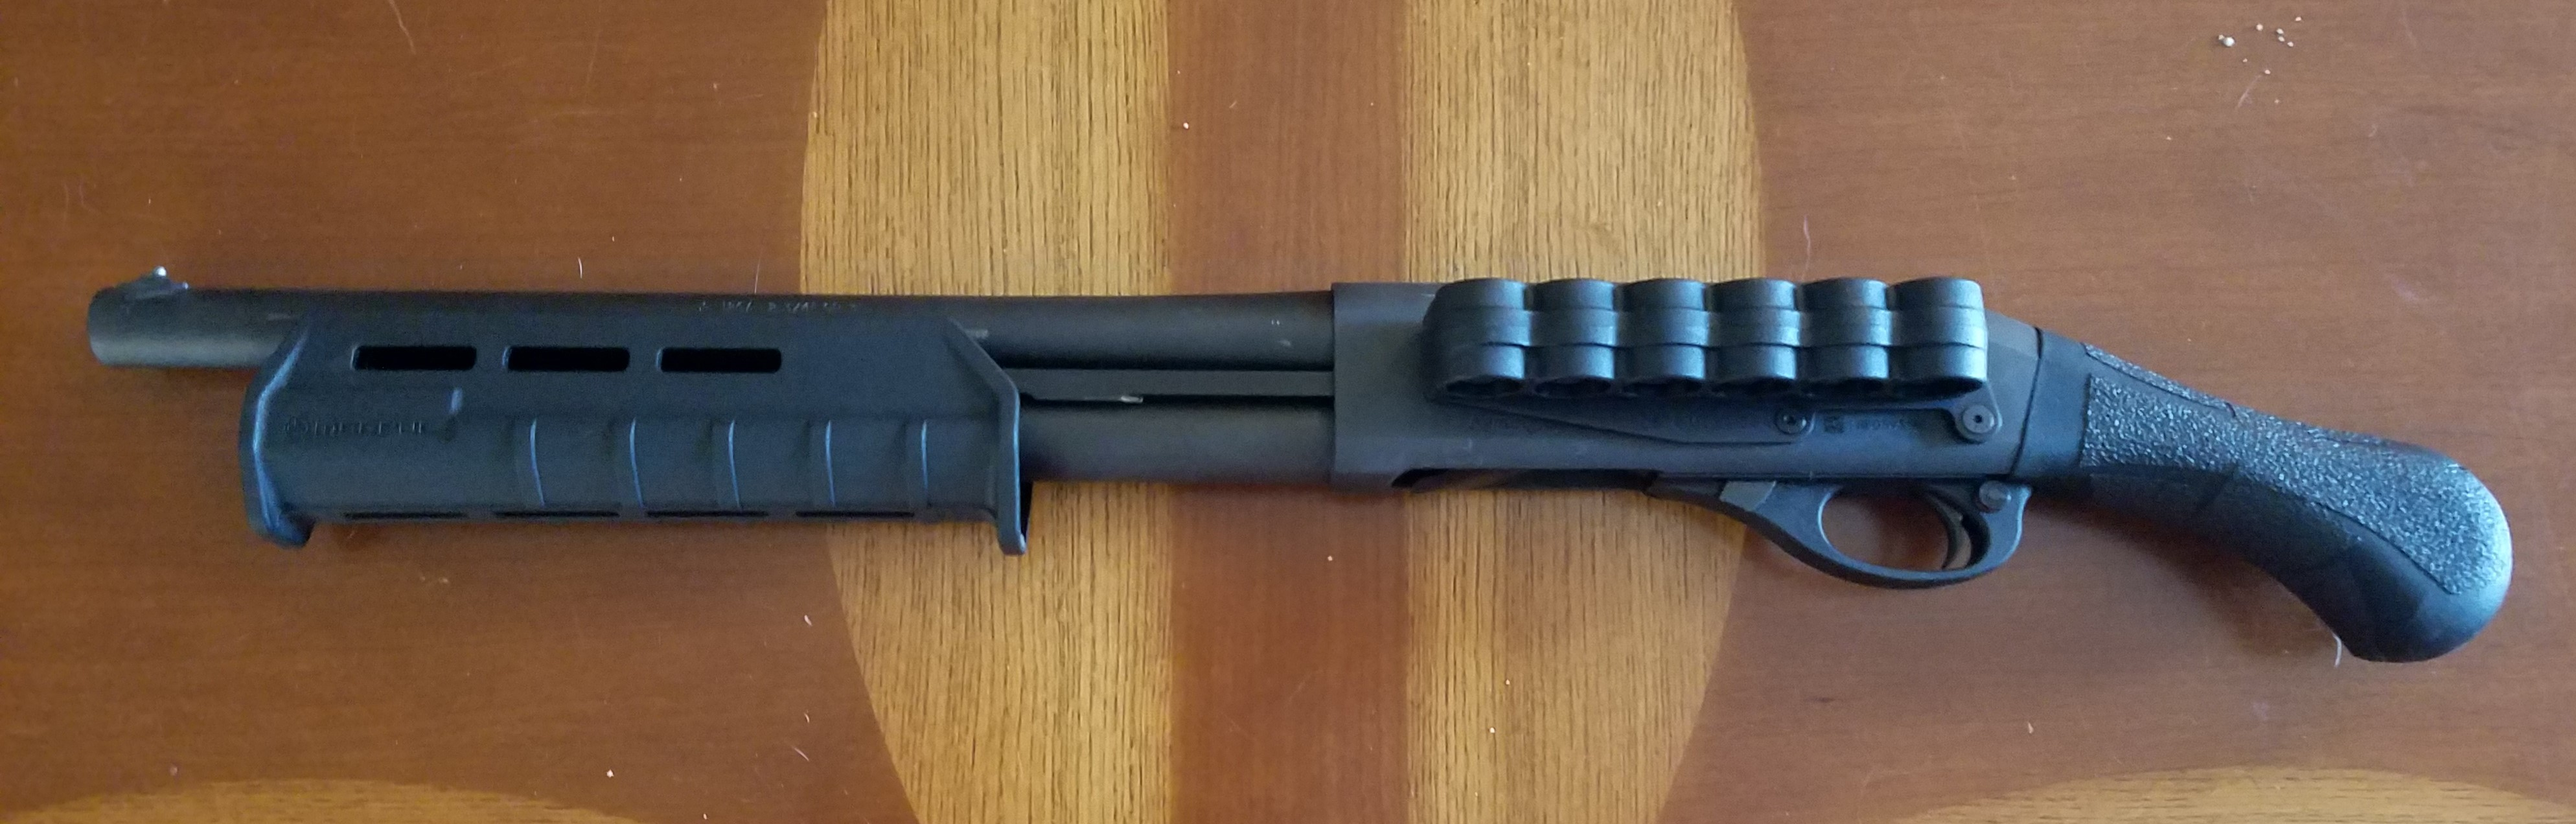 WTS:  Remington 12 gauge 870 TAC-14-20180805_172807.jpg